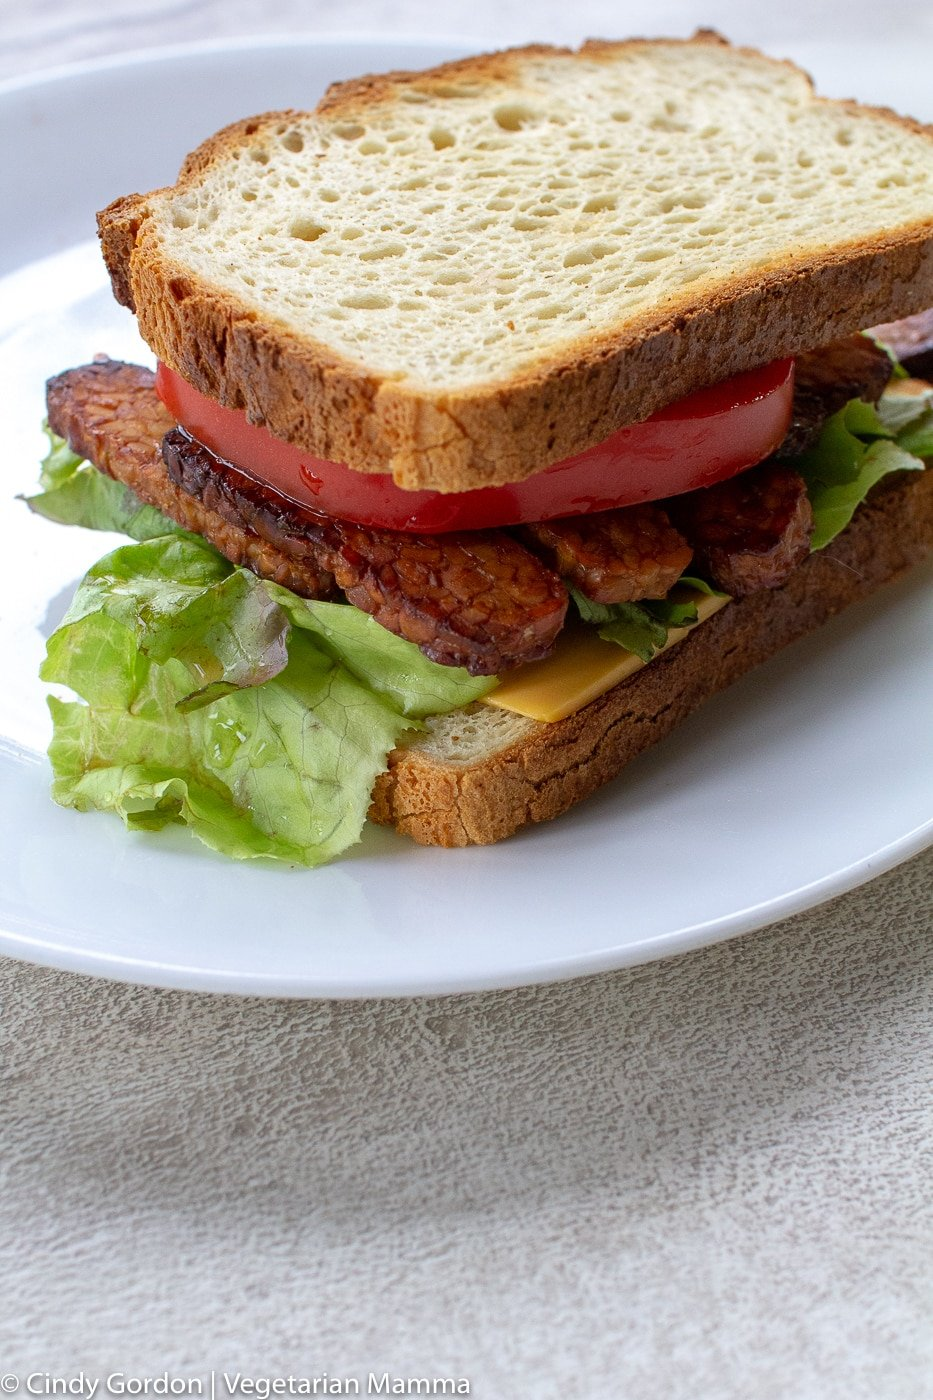 vegan air fryer bacon on a sandwich